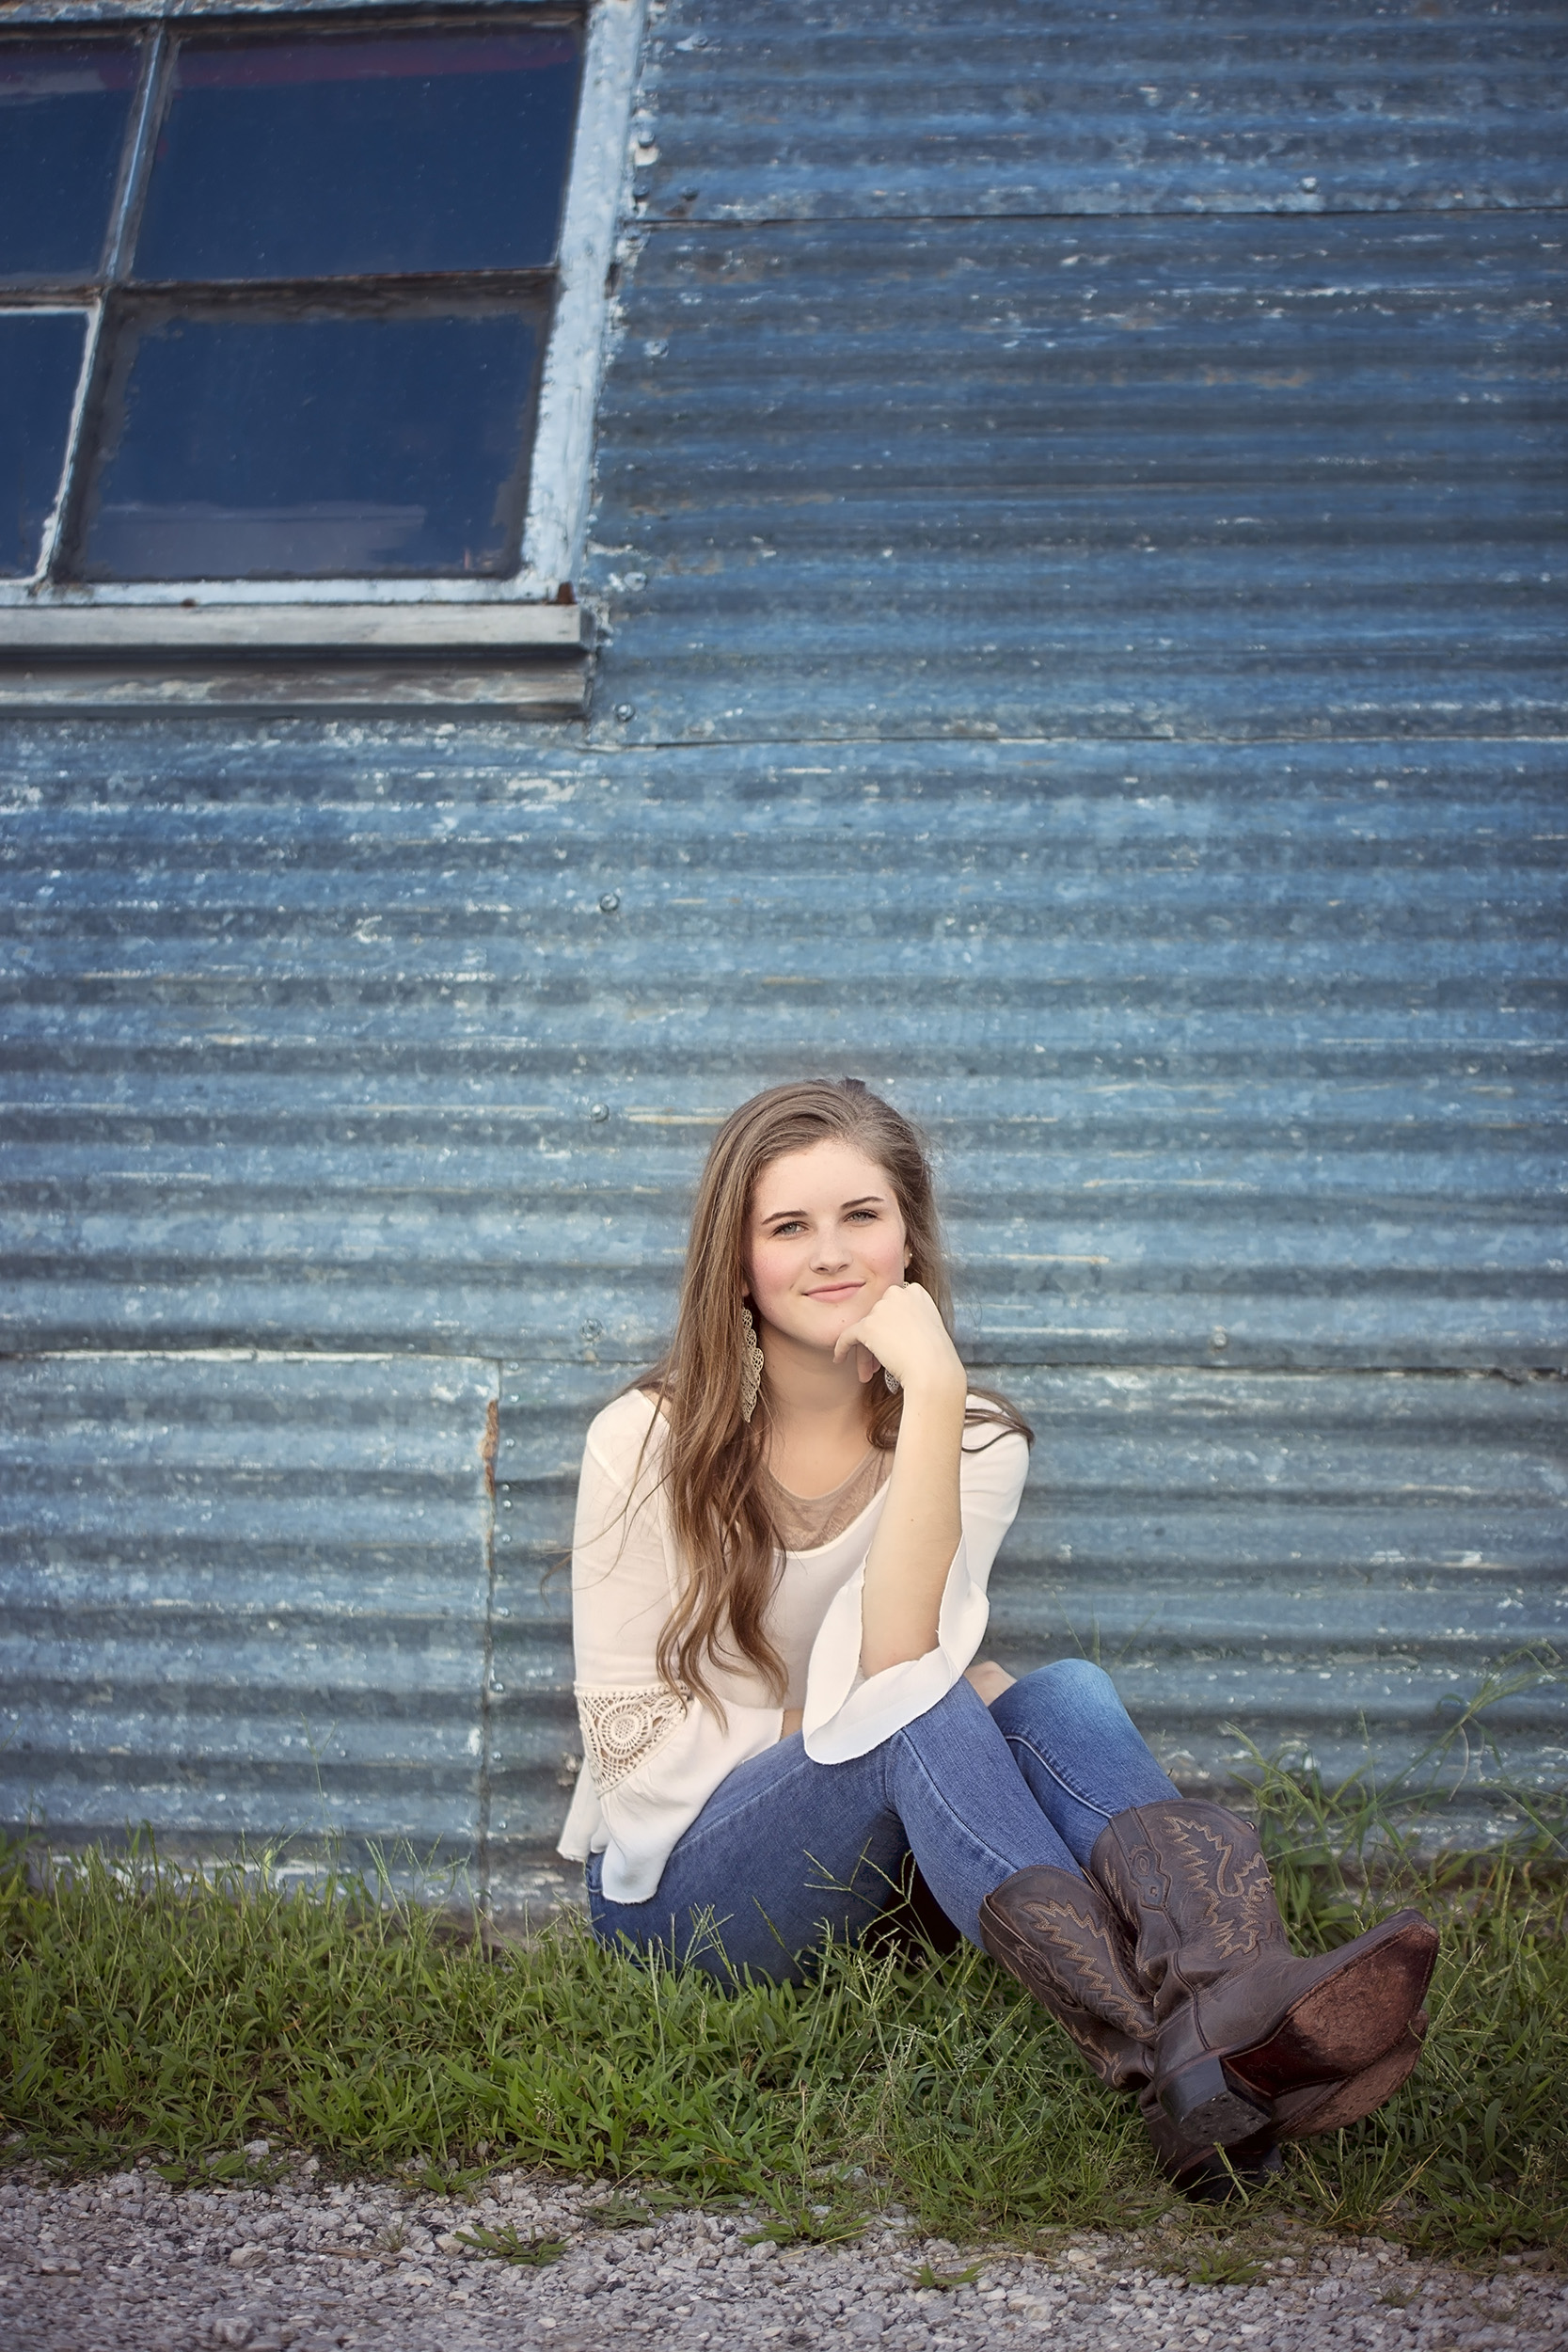 springfield-mo-senior-portrait-photography (8).jpg